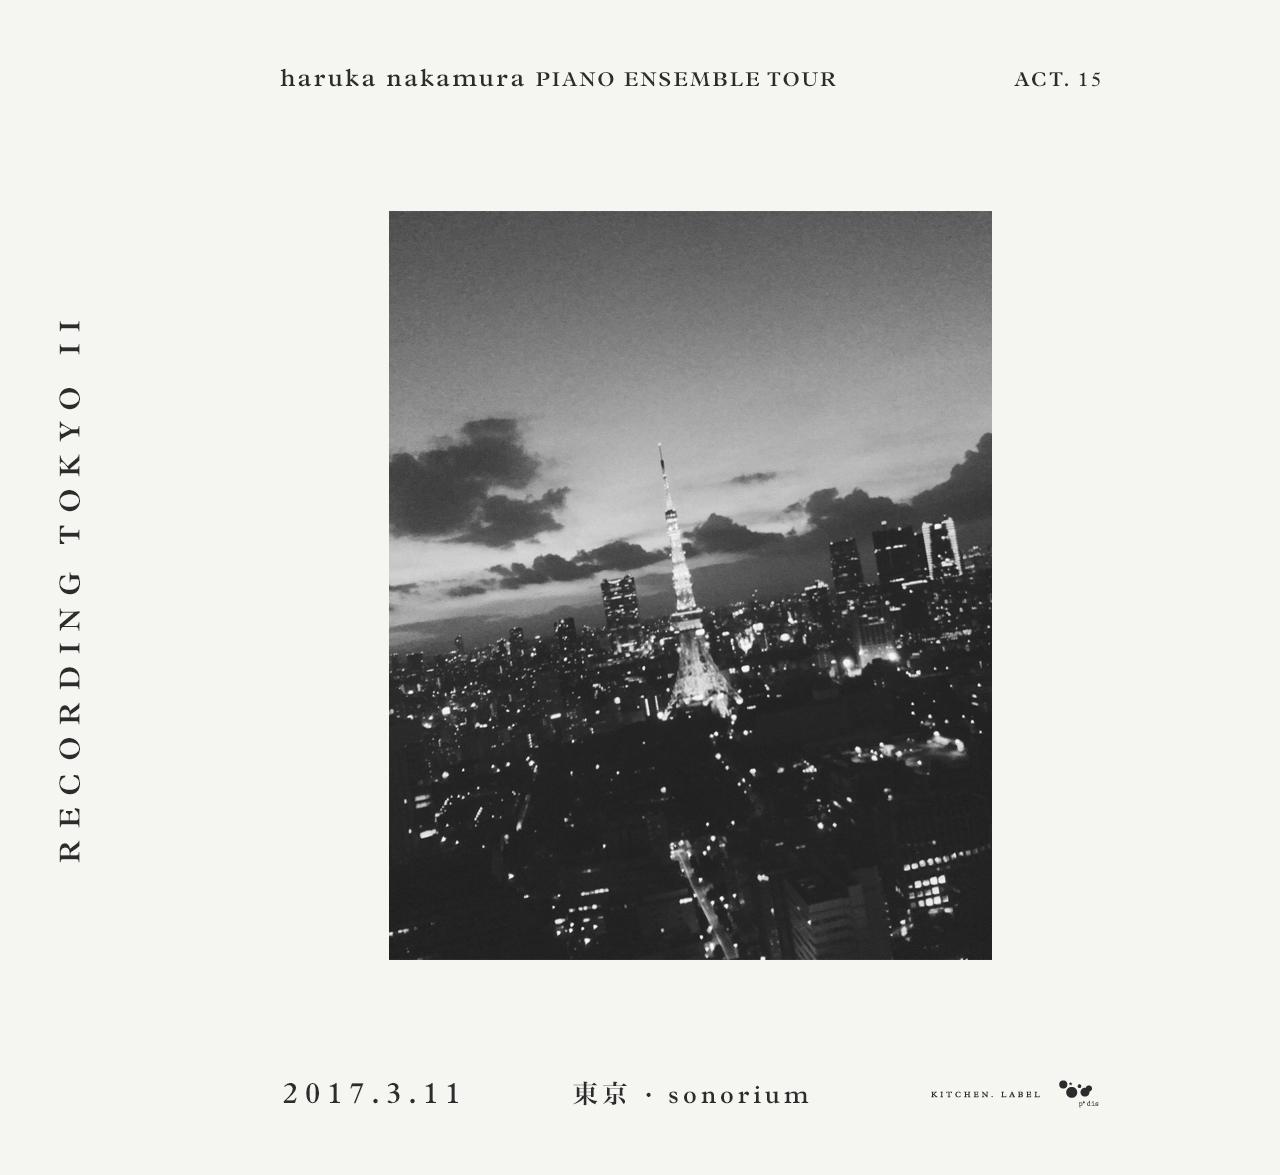 haruka nakamura PIANO ENSEMBLE TOUR  ACT. 15「RECORDING TOKYO Ⅱ」